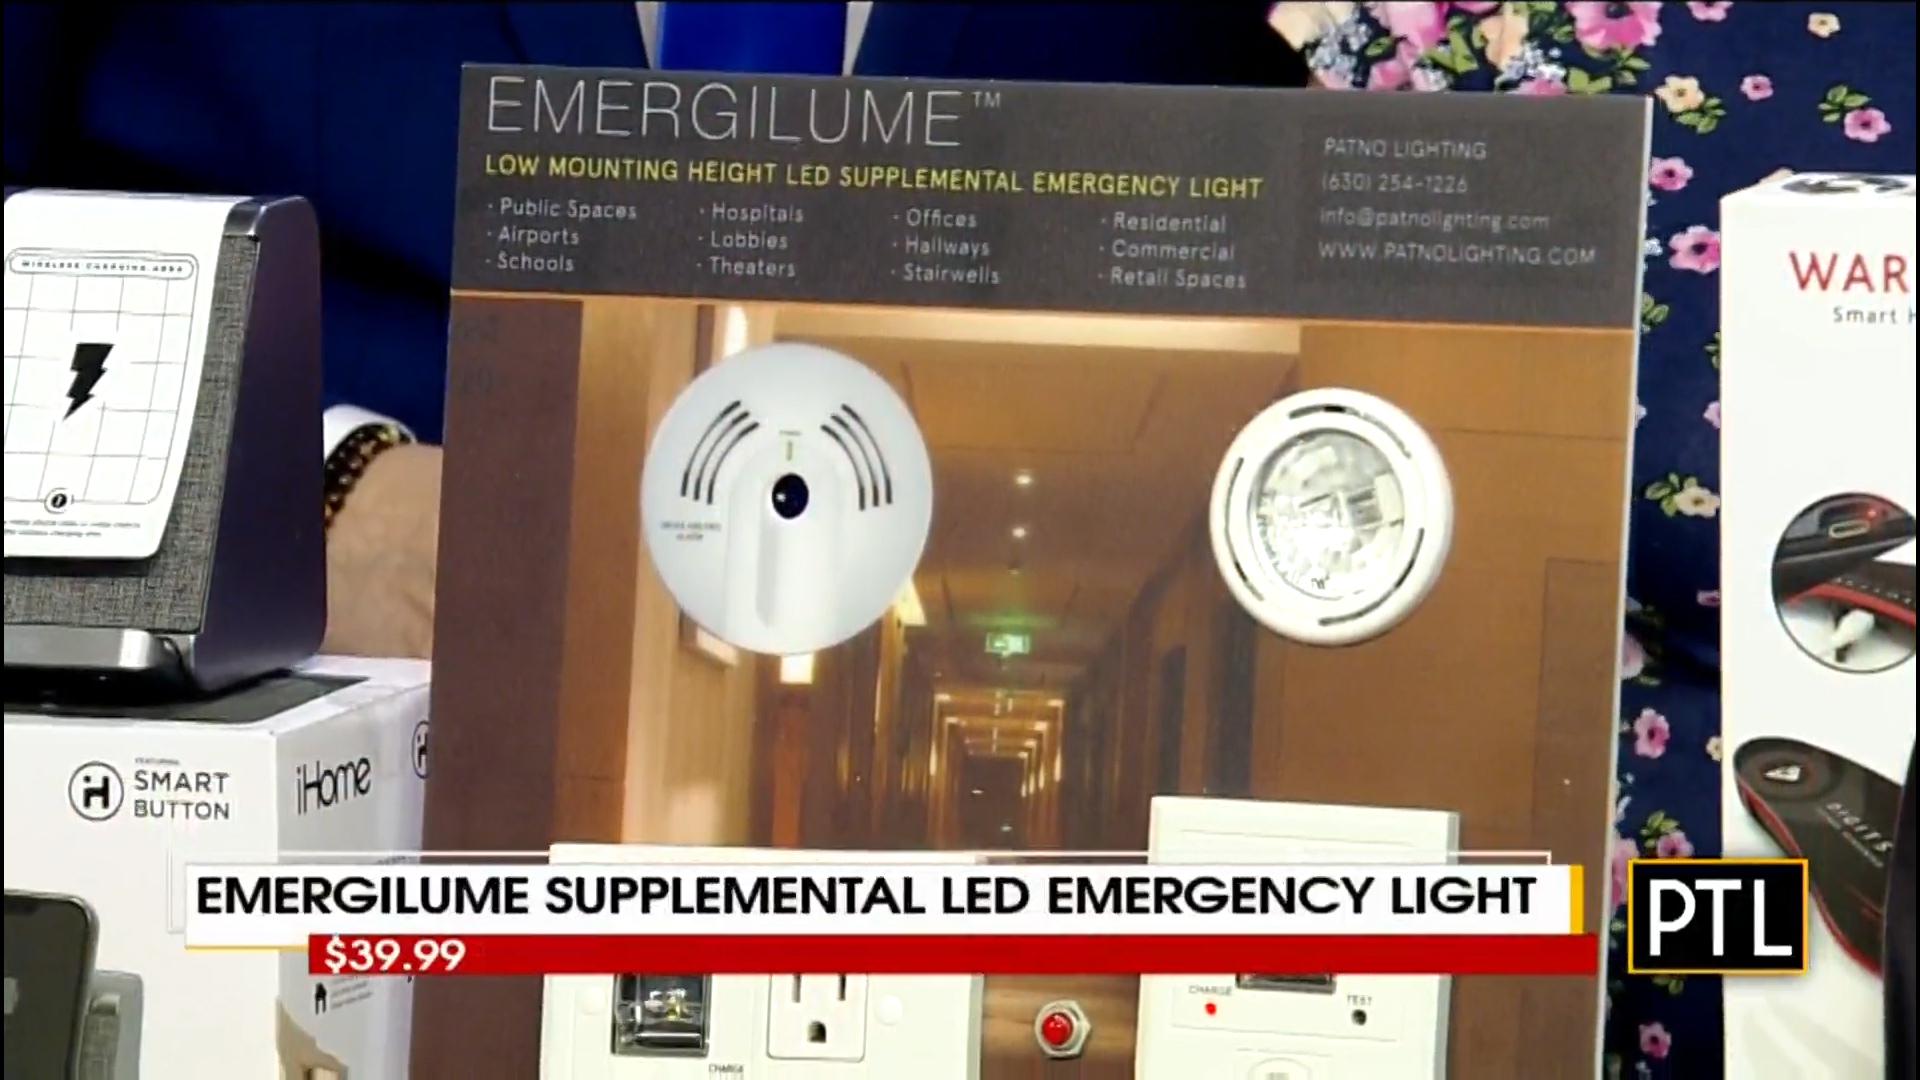 EMERGILUME SUPPLEMENTAL LED EMERGENCY LIGHT - $39.99Shop Now